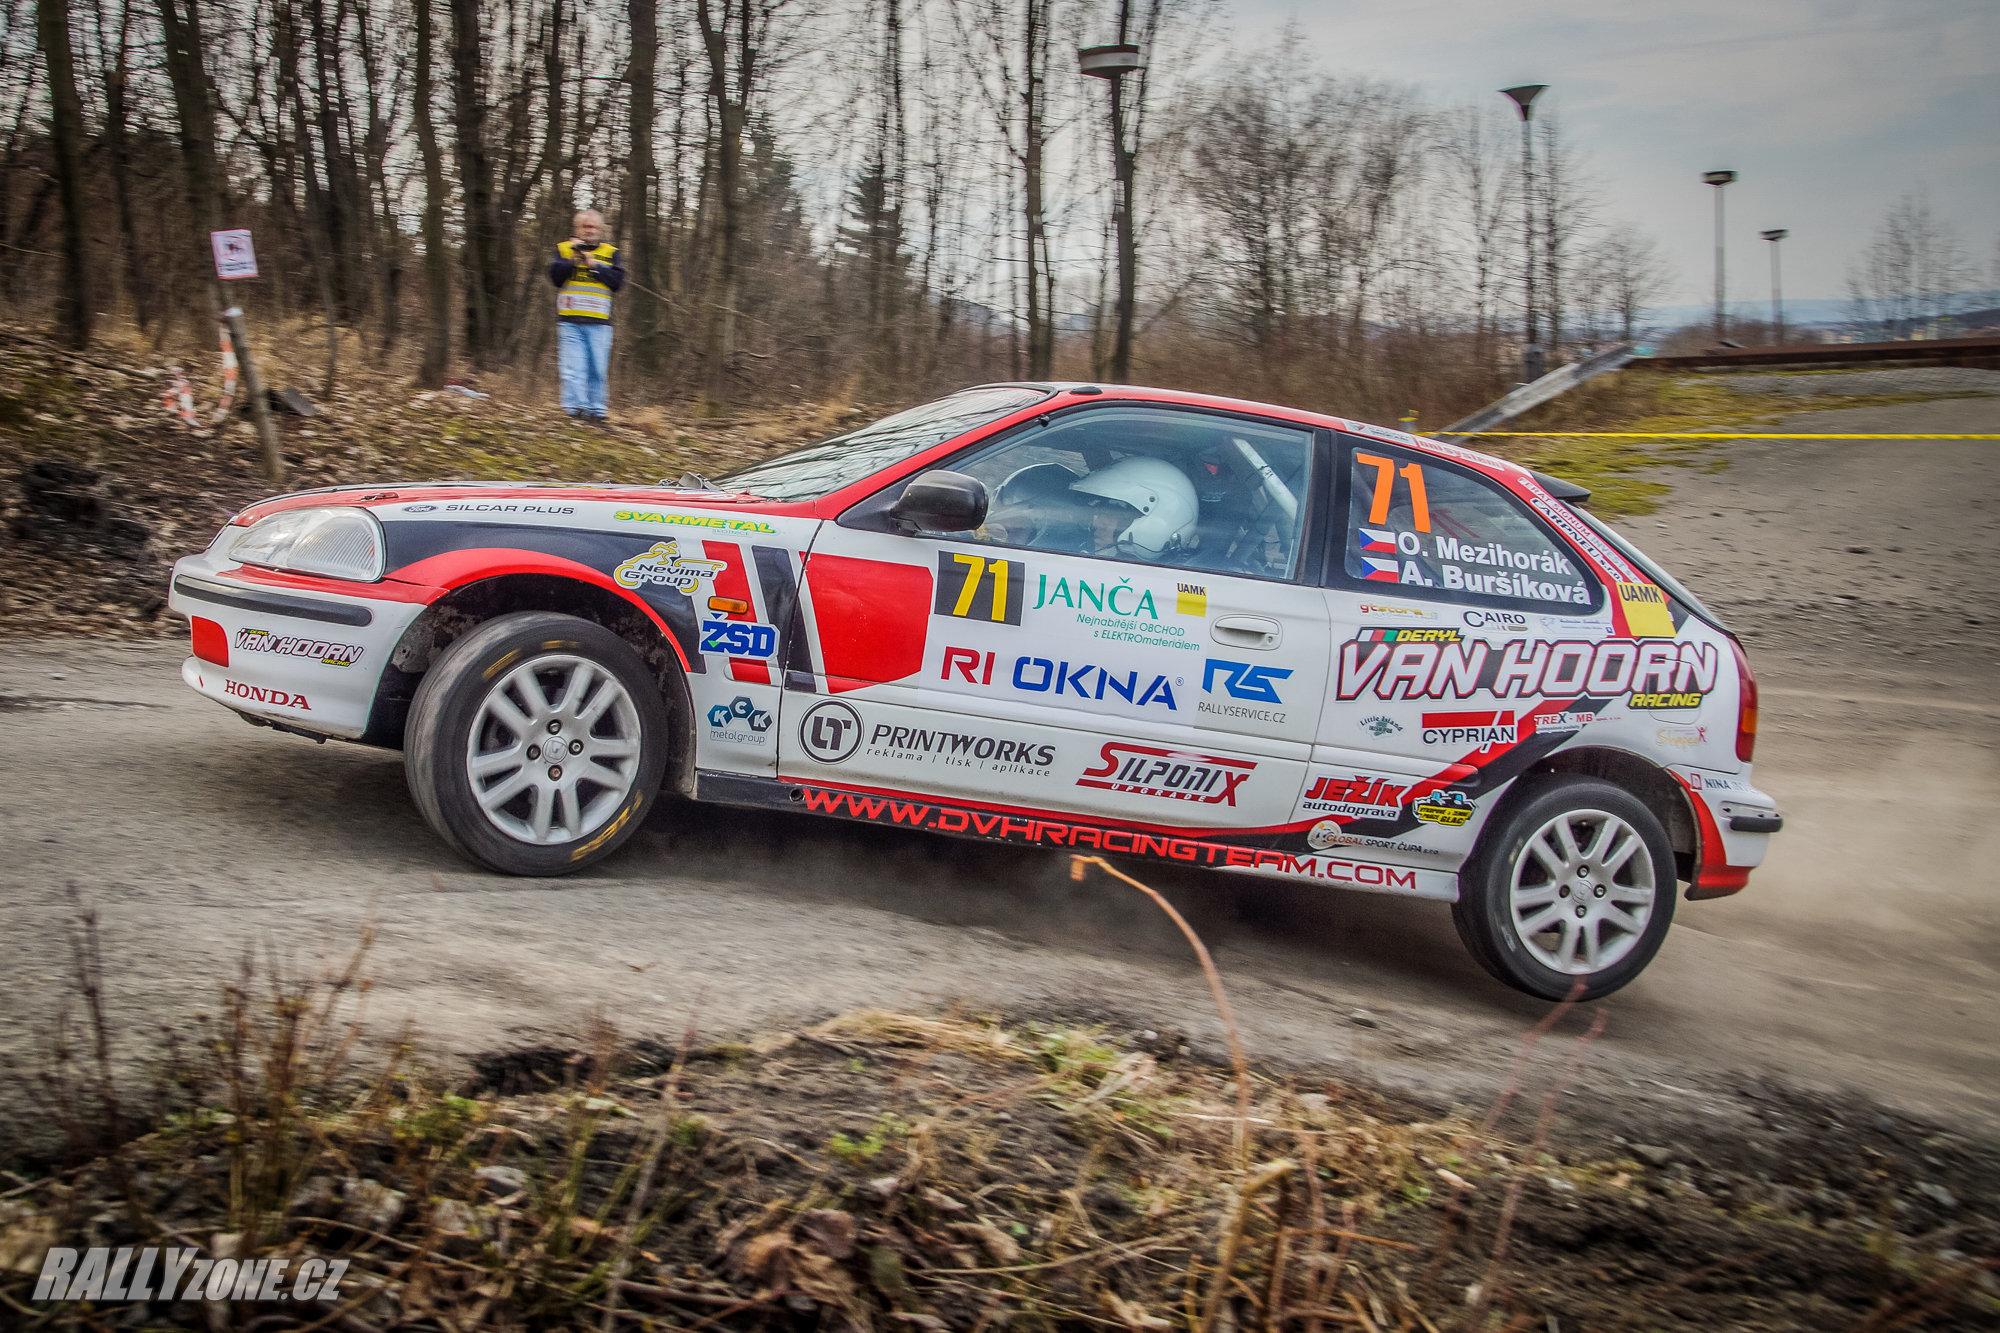 Valašská Rally (CZE)